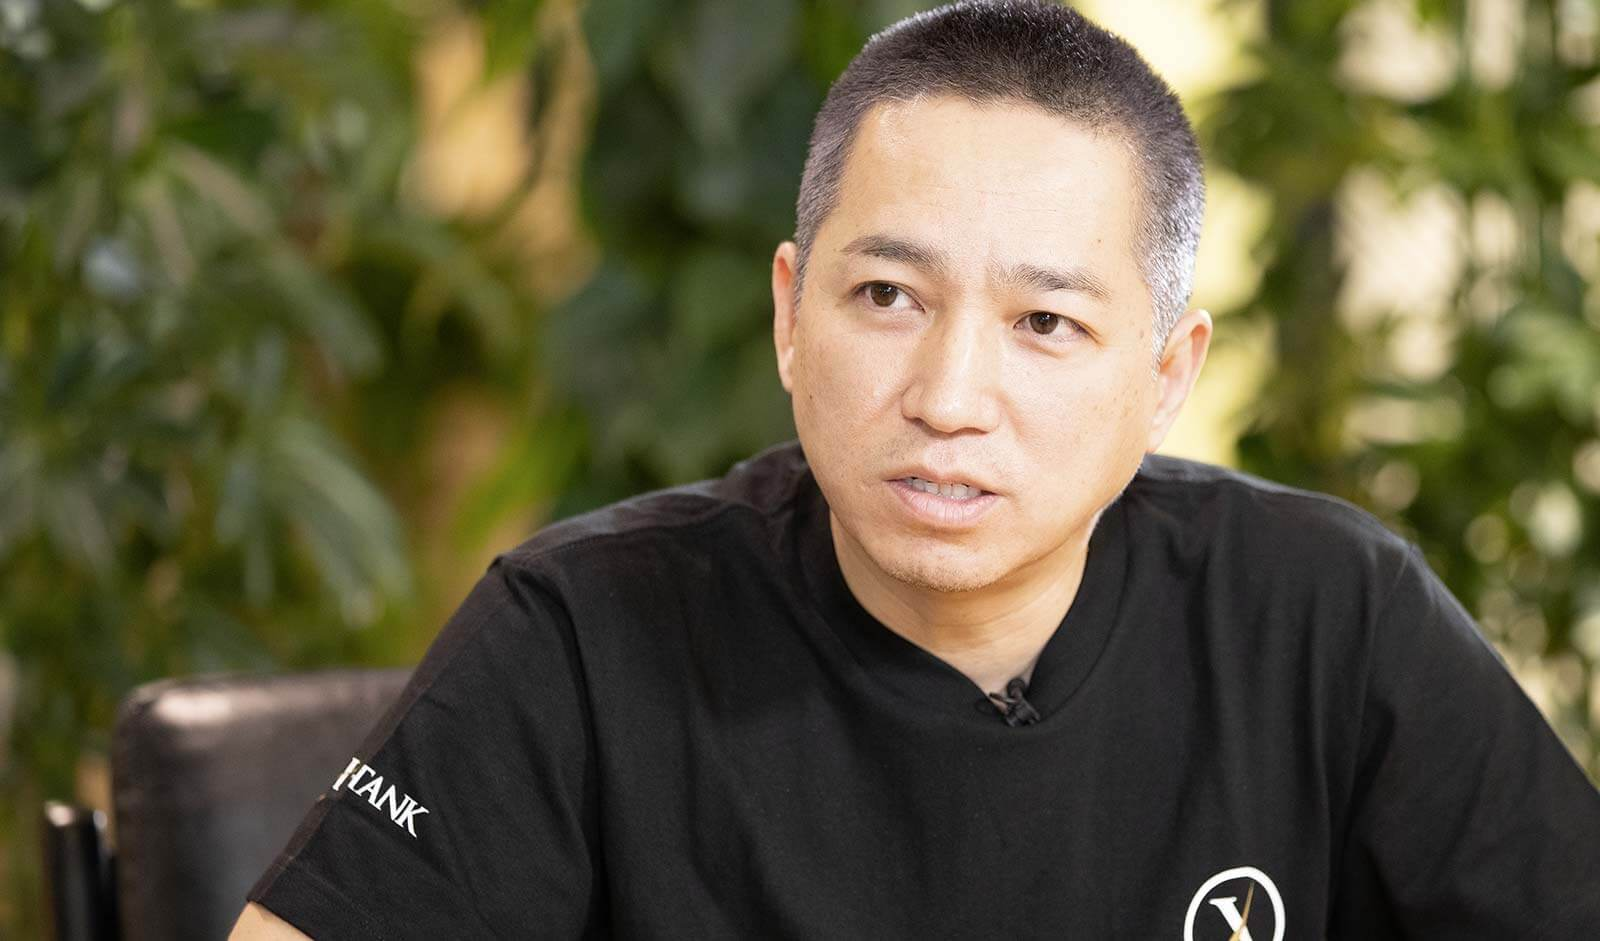 X-TANKコンサルティング CEO 伊藤嘉明氏